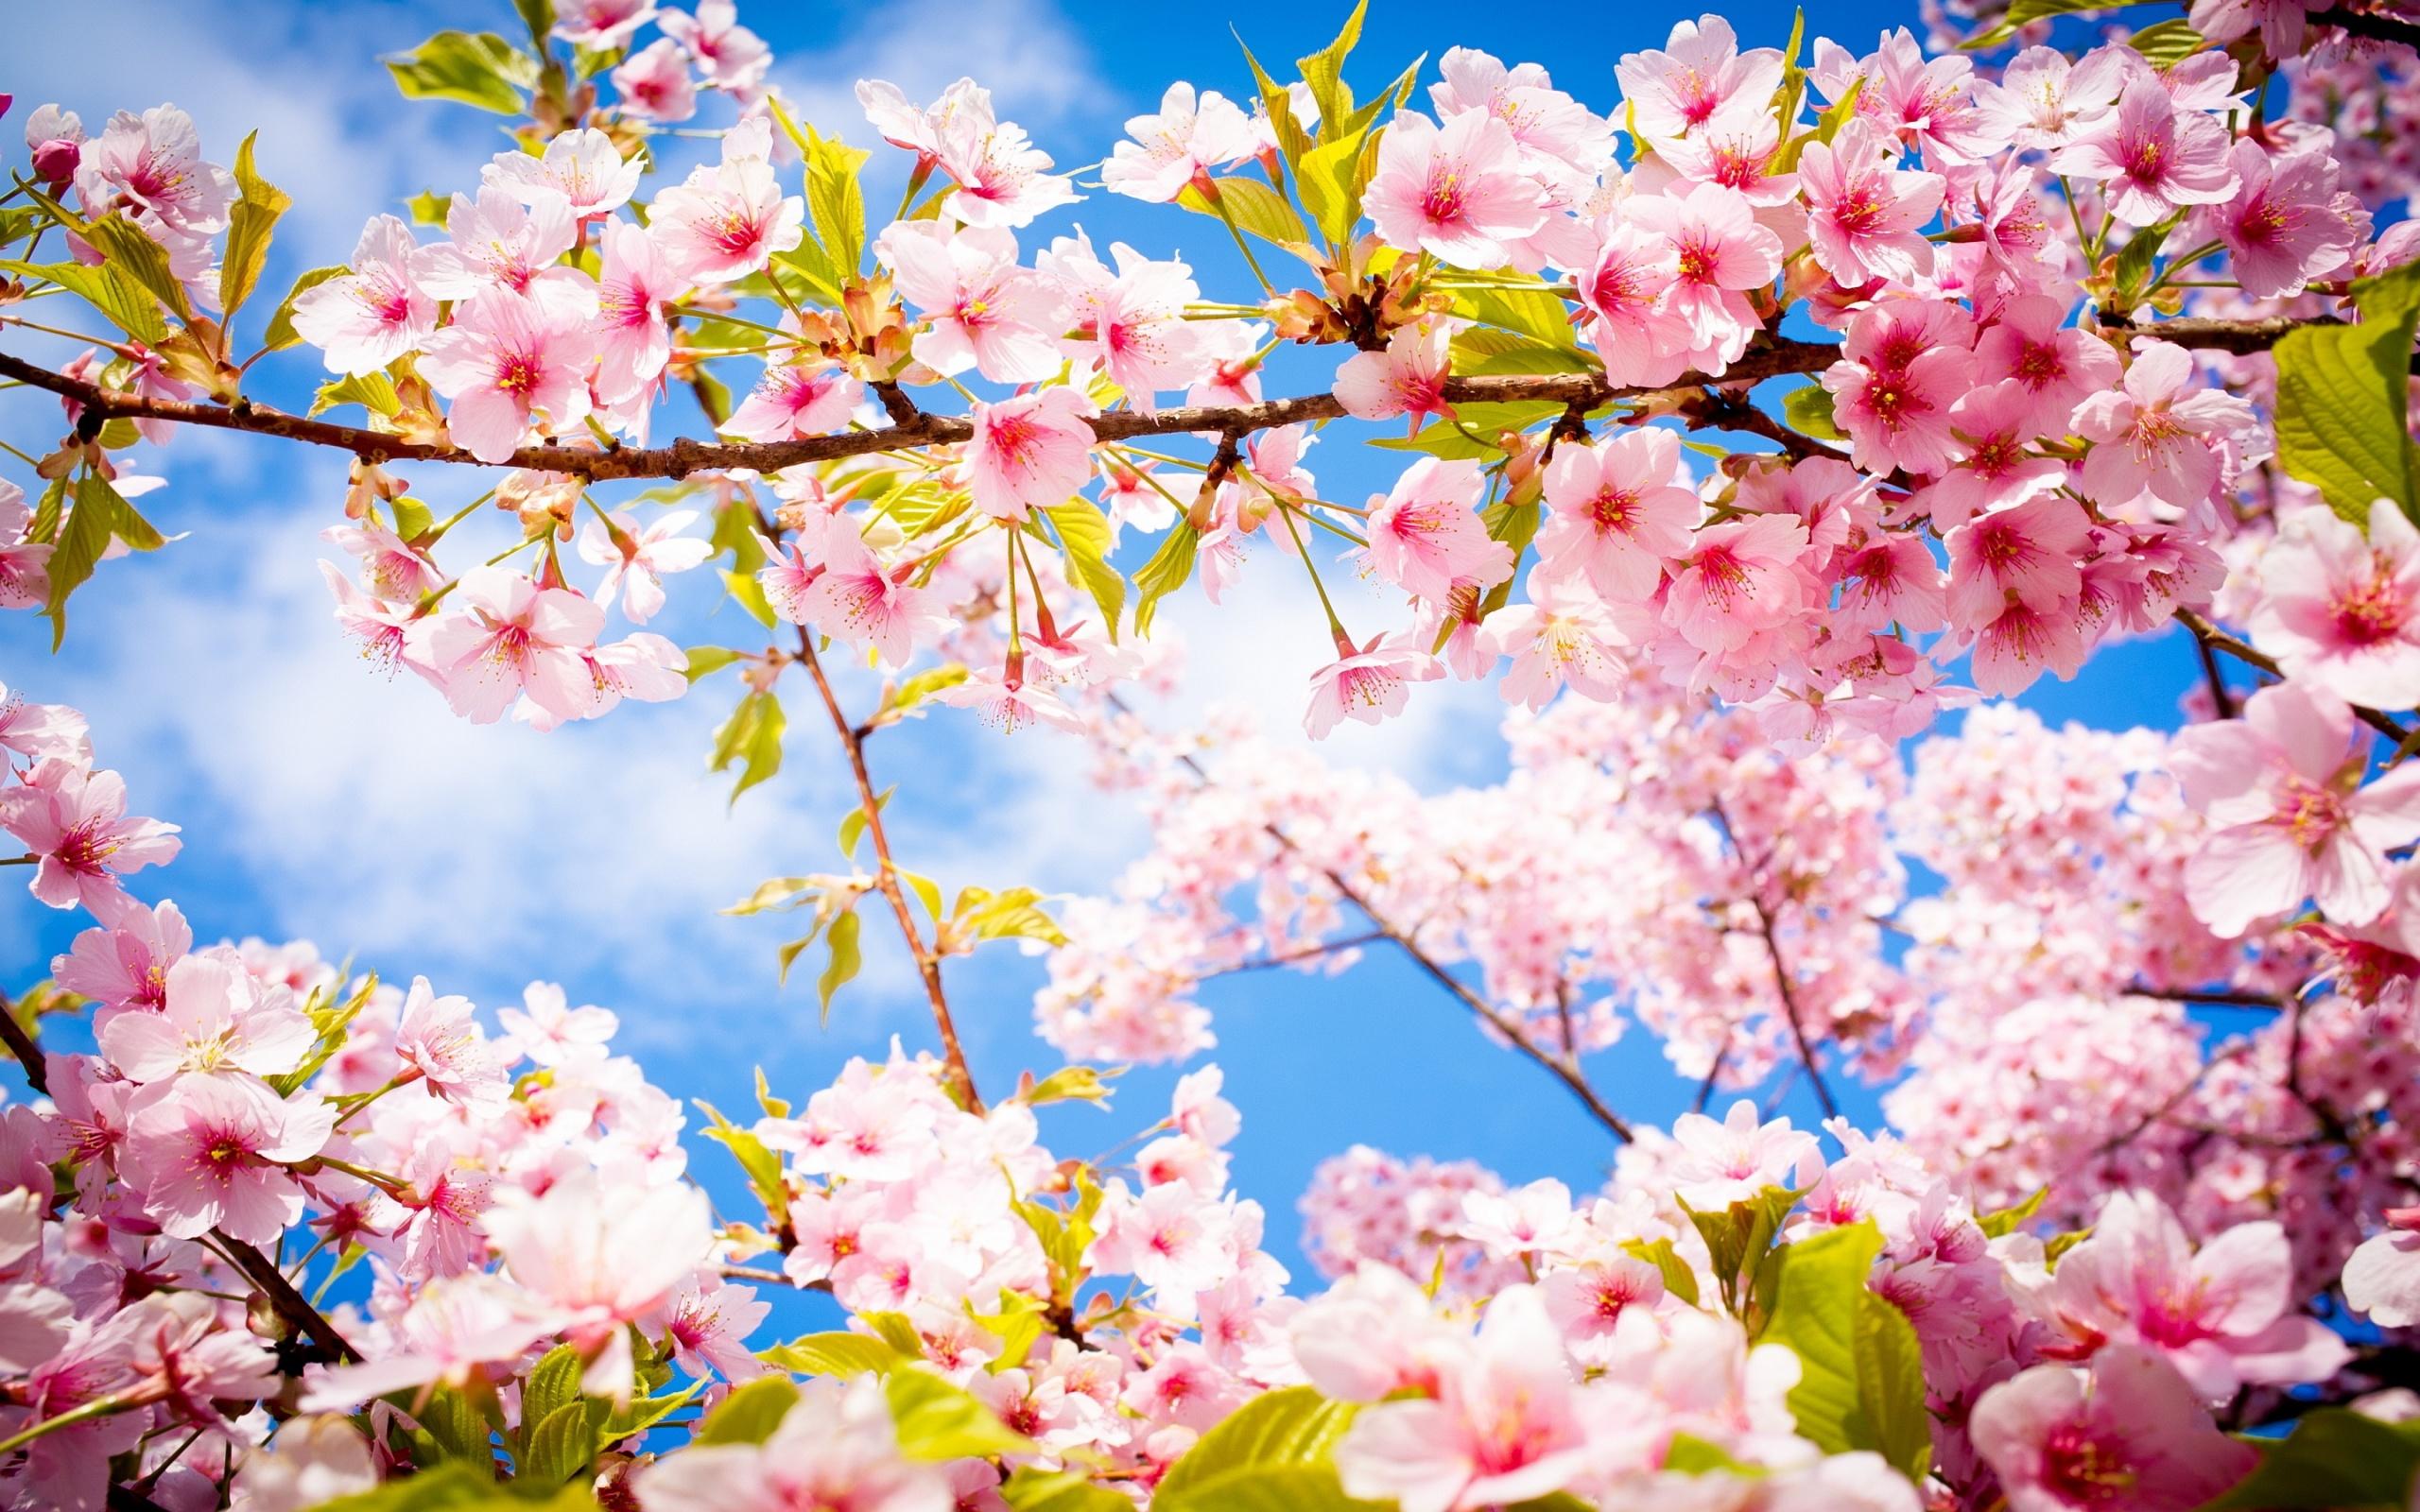 Cherry Blossom Hd Hd Desktop Wallpapers 4k Hd